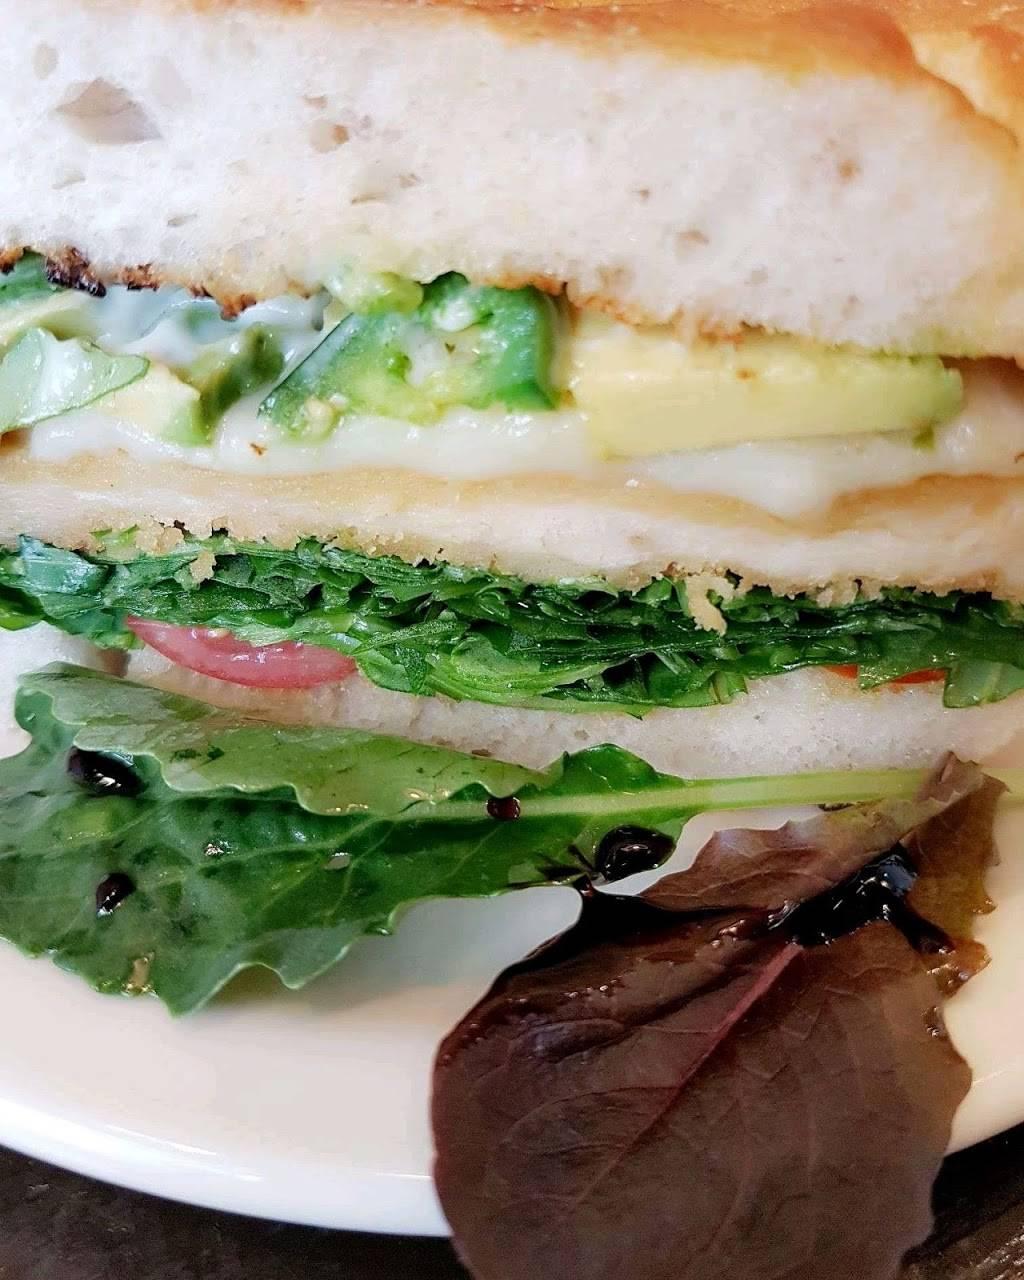 Piccolo Cafe | cafe | 274 W 40th St, New York, NY 10018, USA | 2123020143 OR +1 212-302-0143